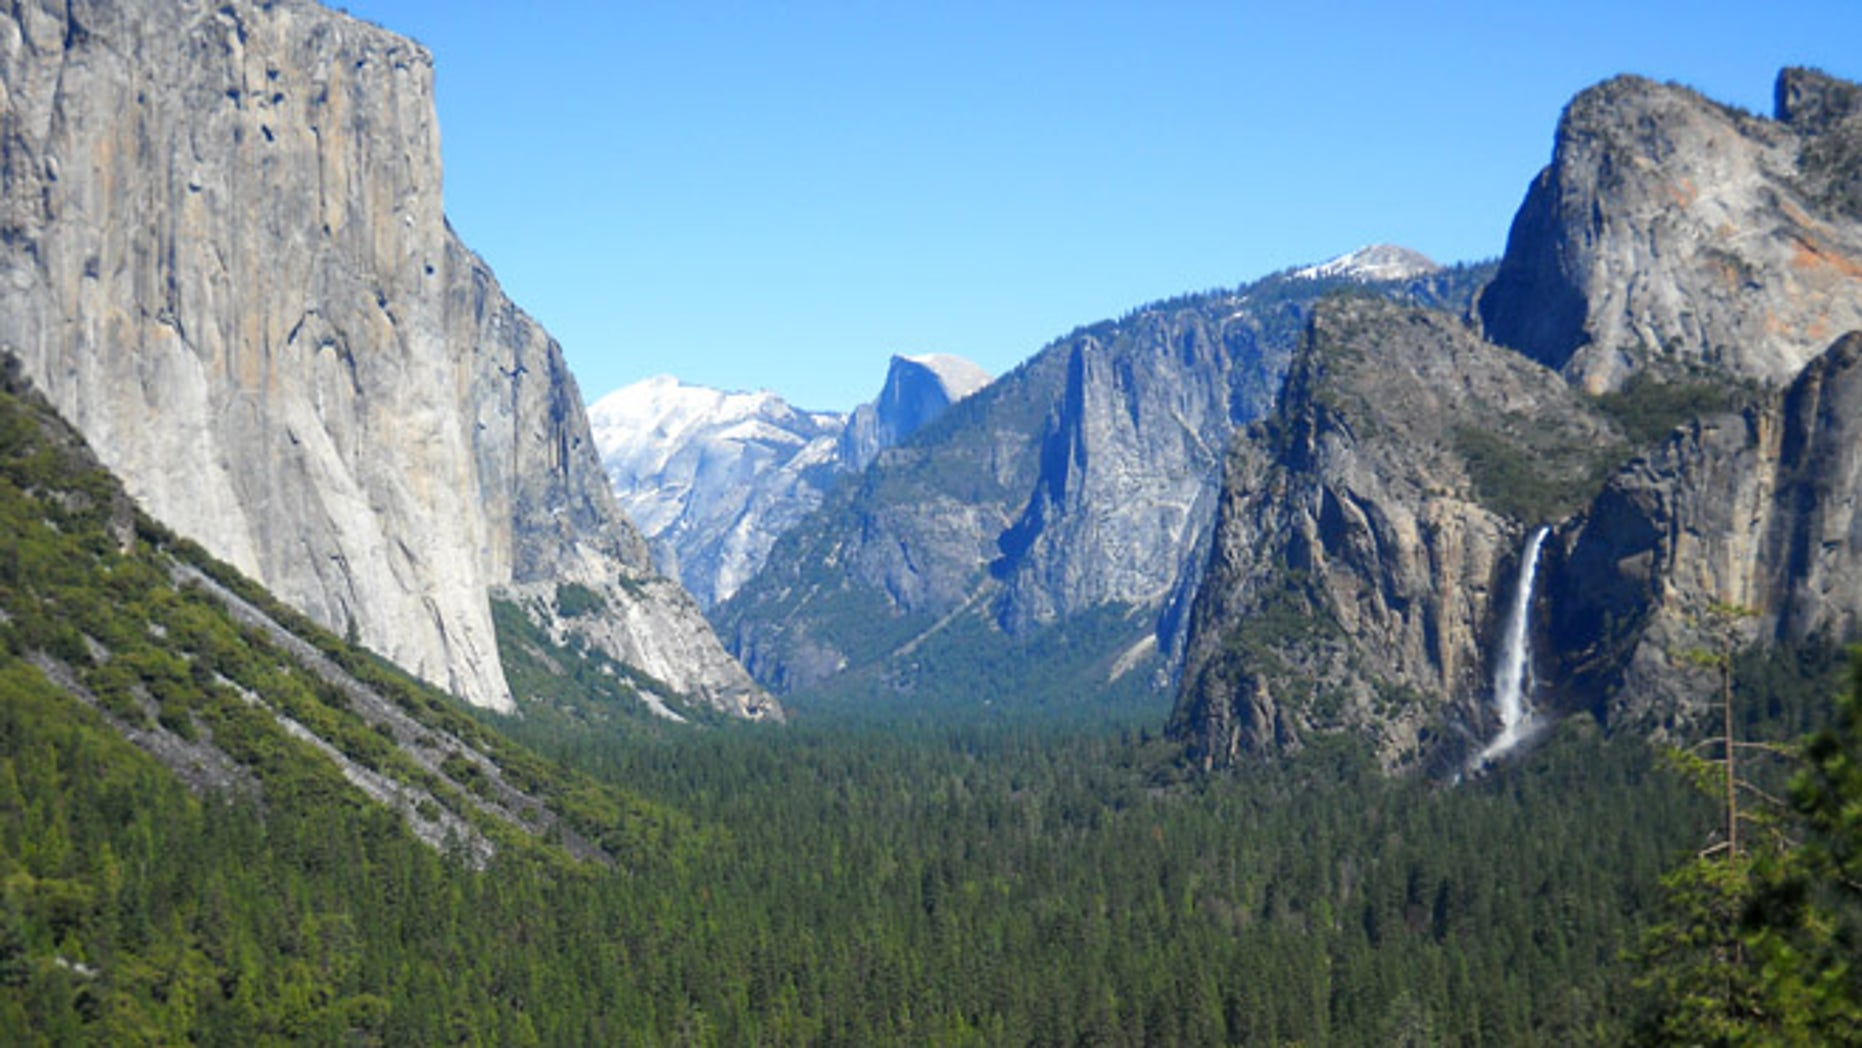 This April 2013 image shows Yosemite Valley at Yosemite National Park in California.